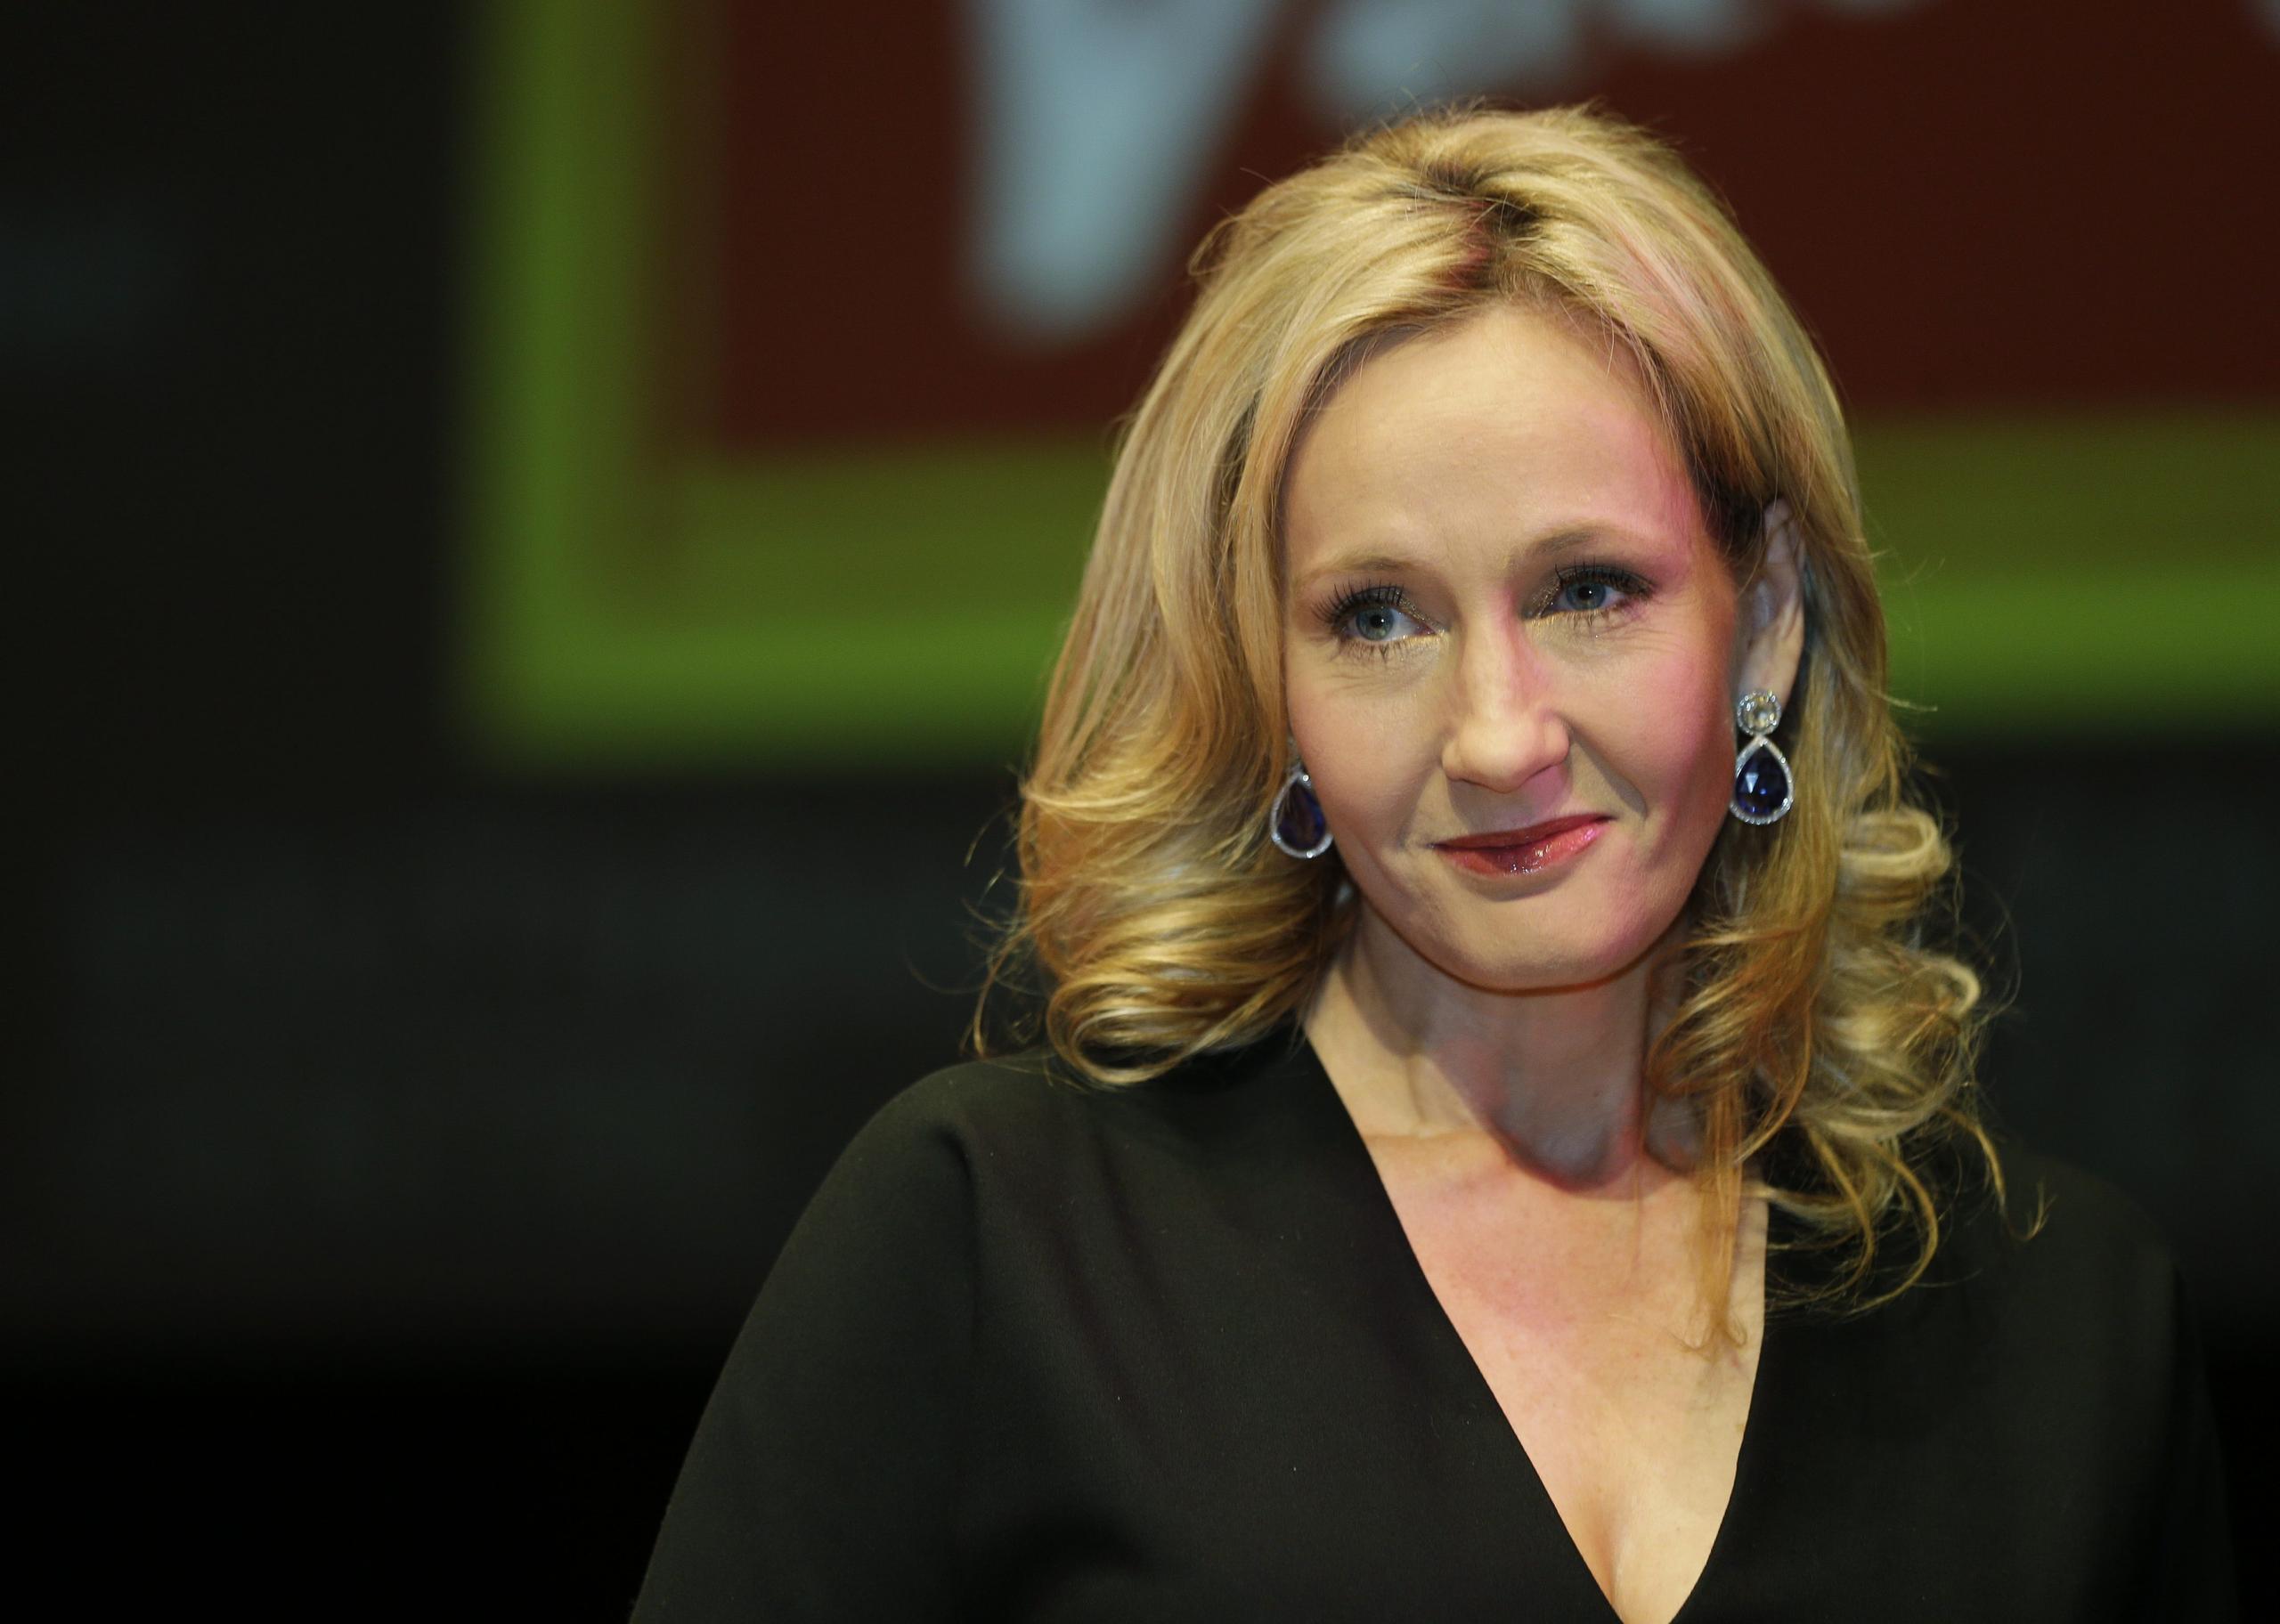 Harry Potter-fansens vrede mot Rowling fortsätter